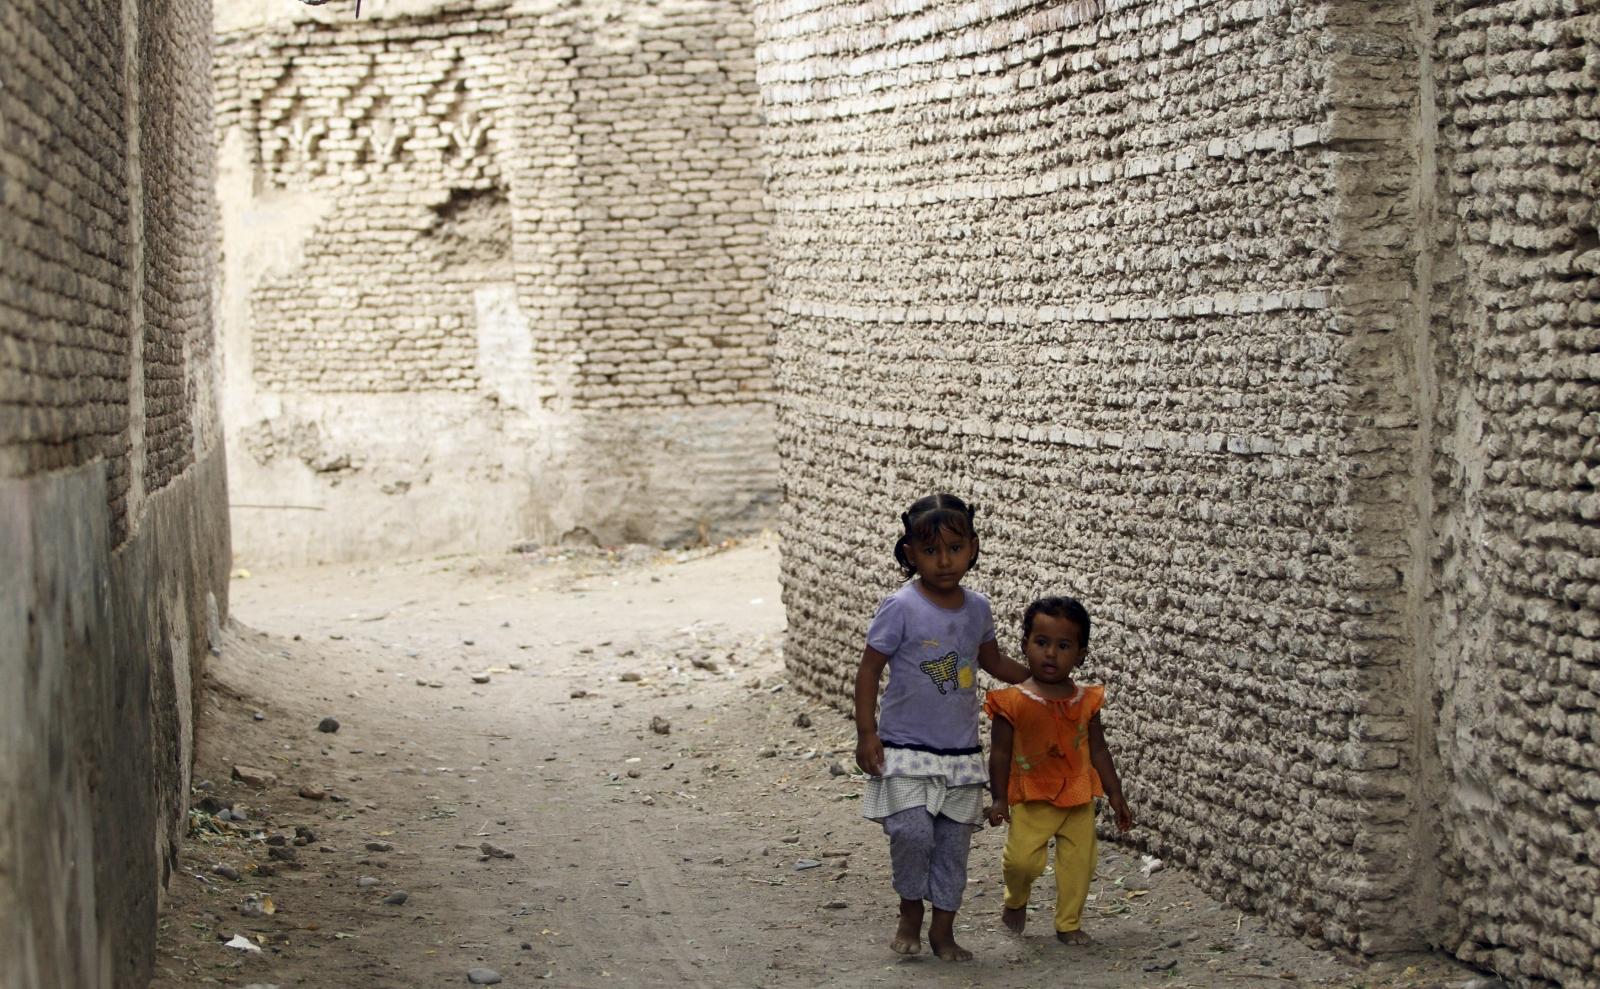 The historical town of Zabid